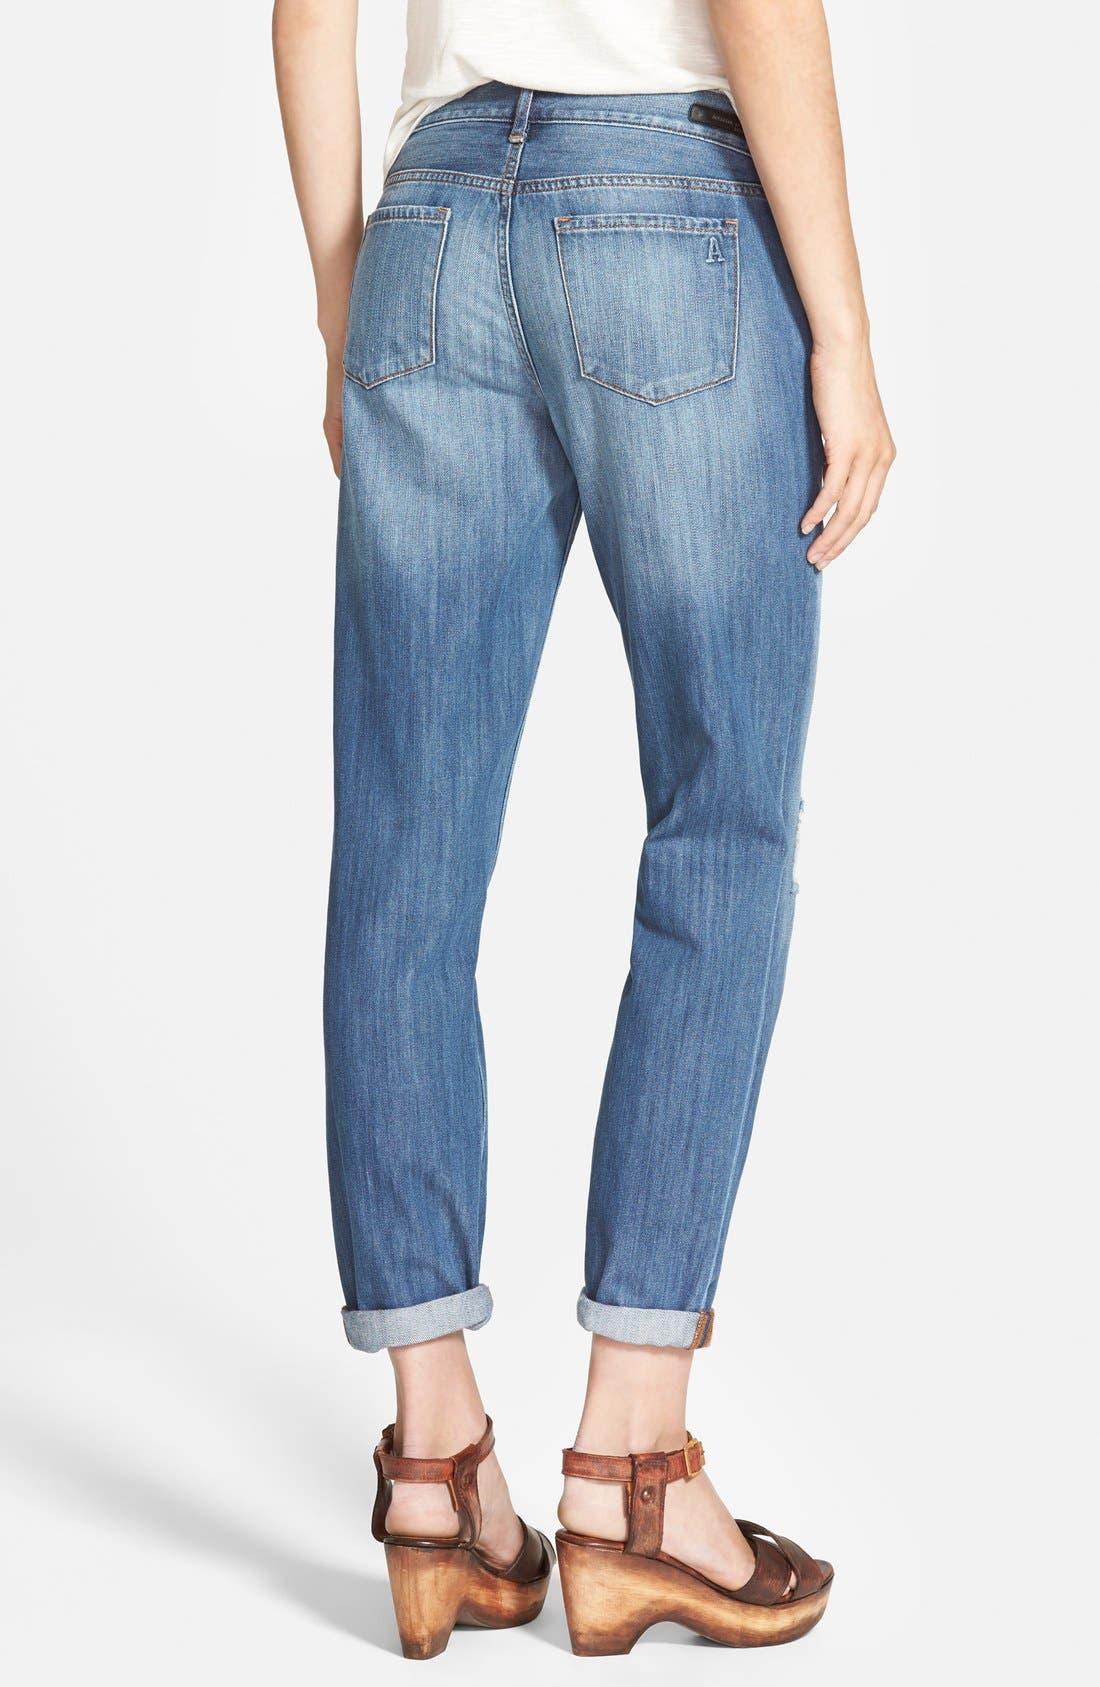 Alternate Image 2  - Articles of Society 'Cindy' Boyfriend Jeans (Medium Wash)